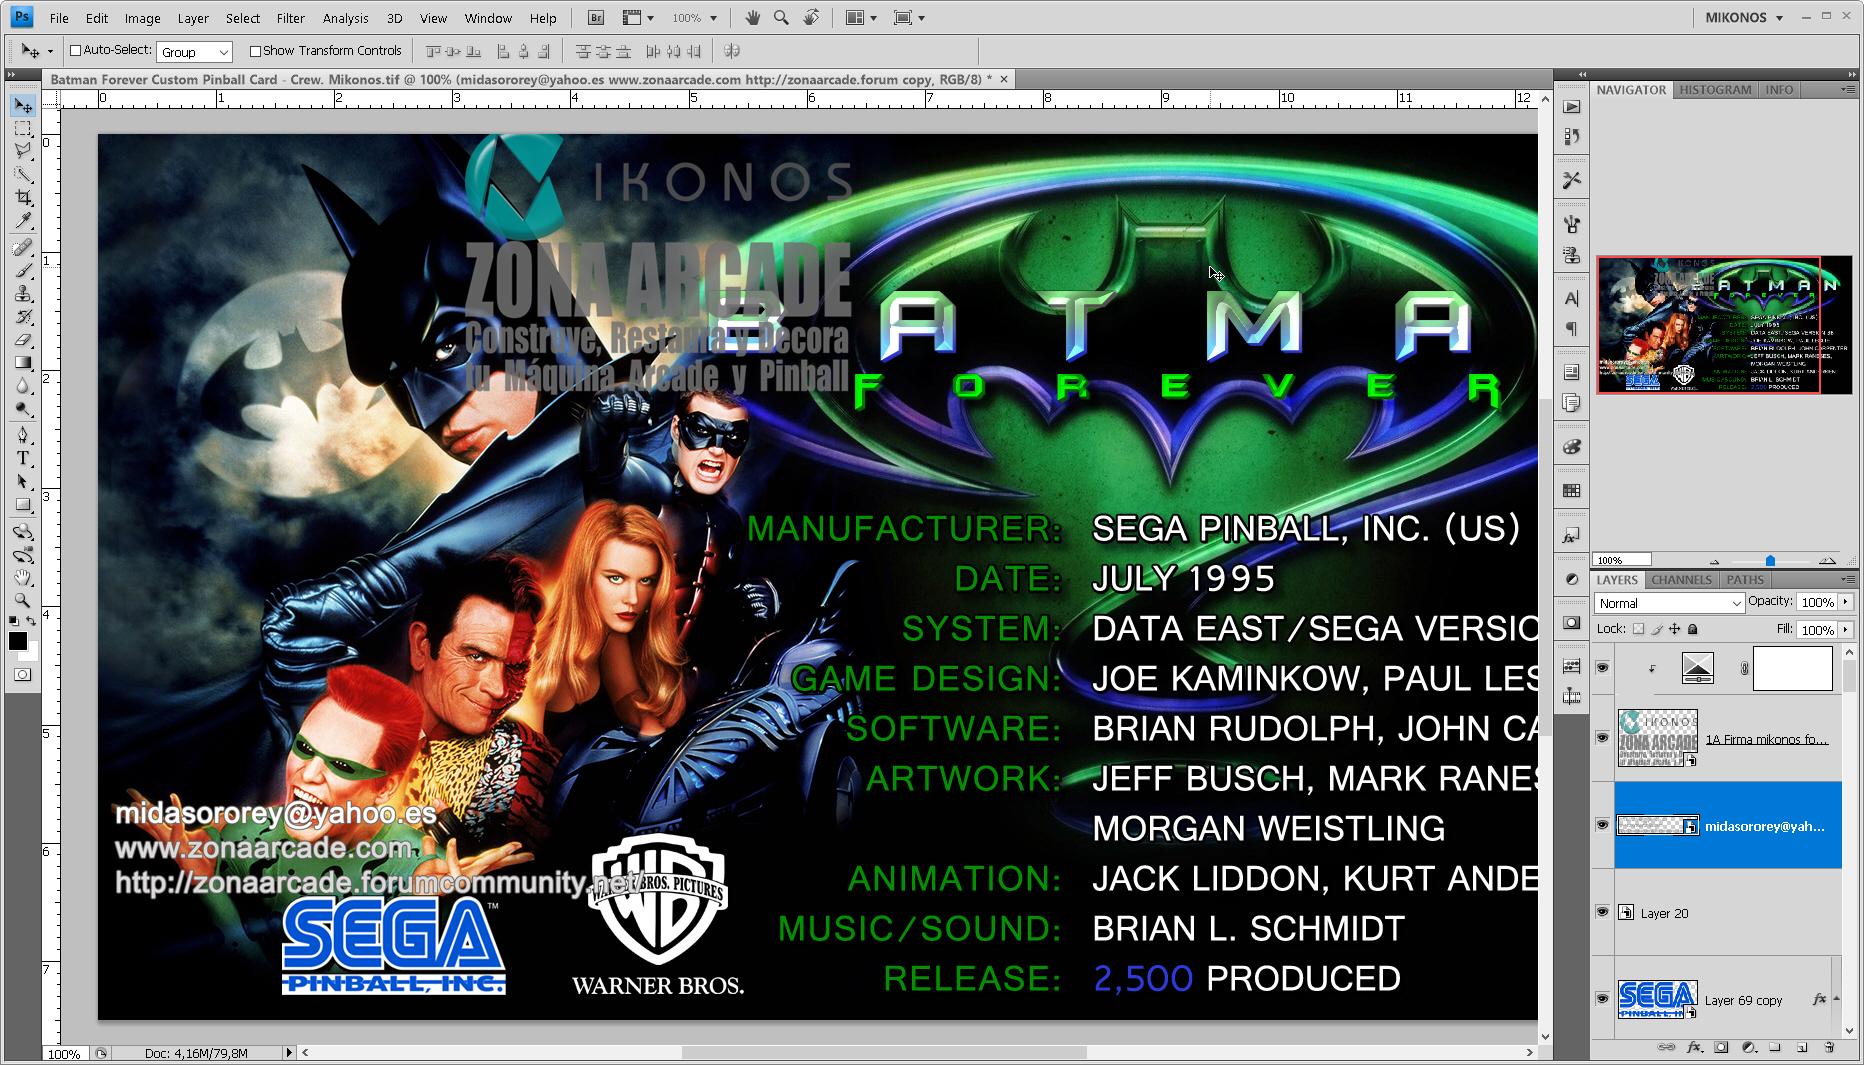 Batman%20Forever%20Custom%20Pinball%20Card%20-%20Crew.%20Mikonos2.jpg